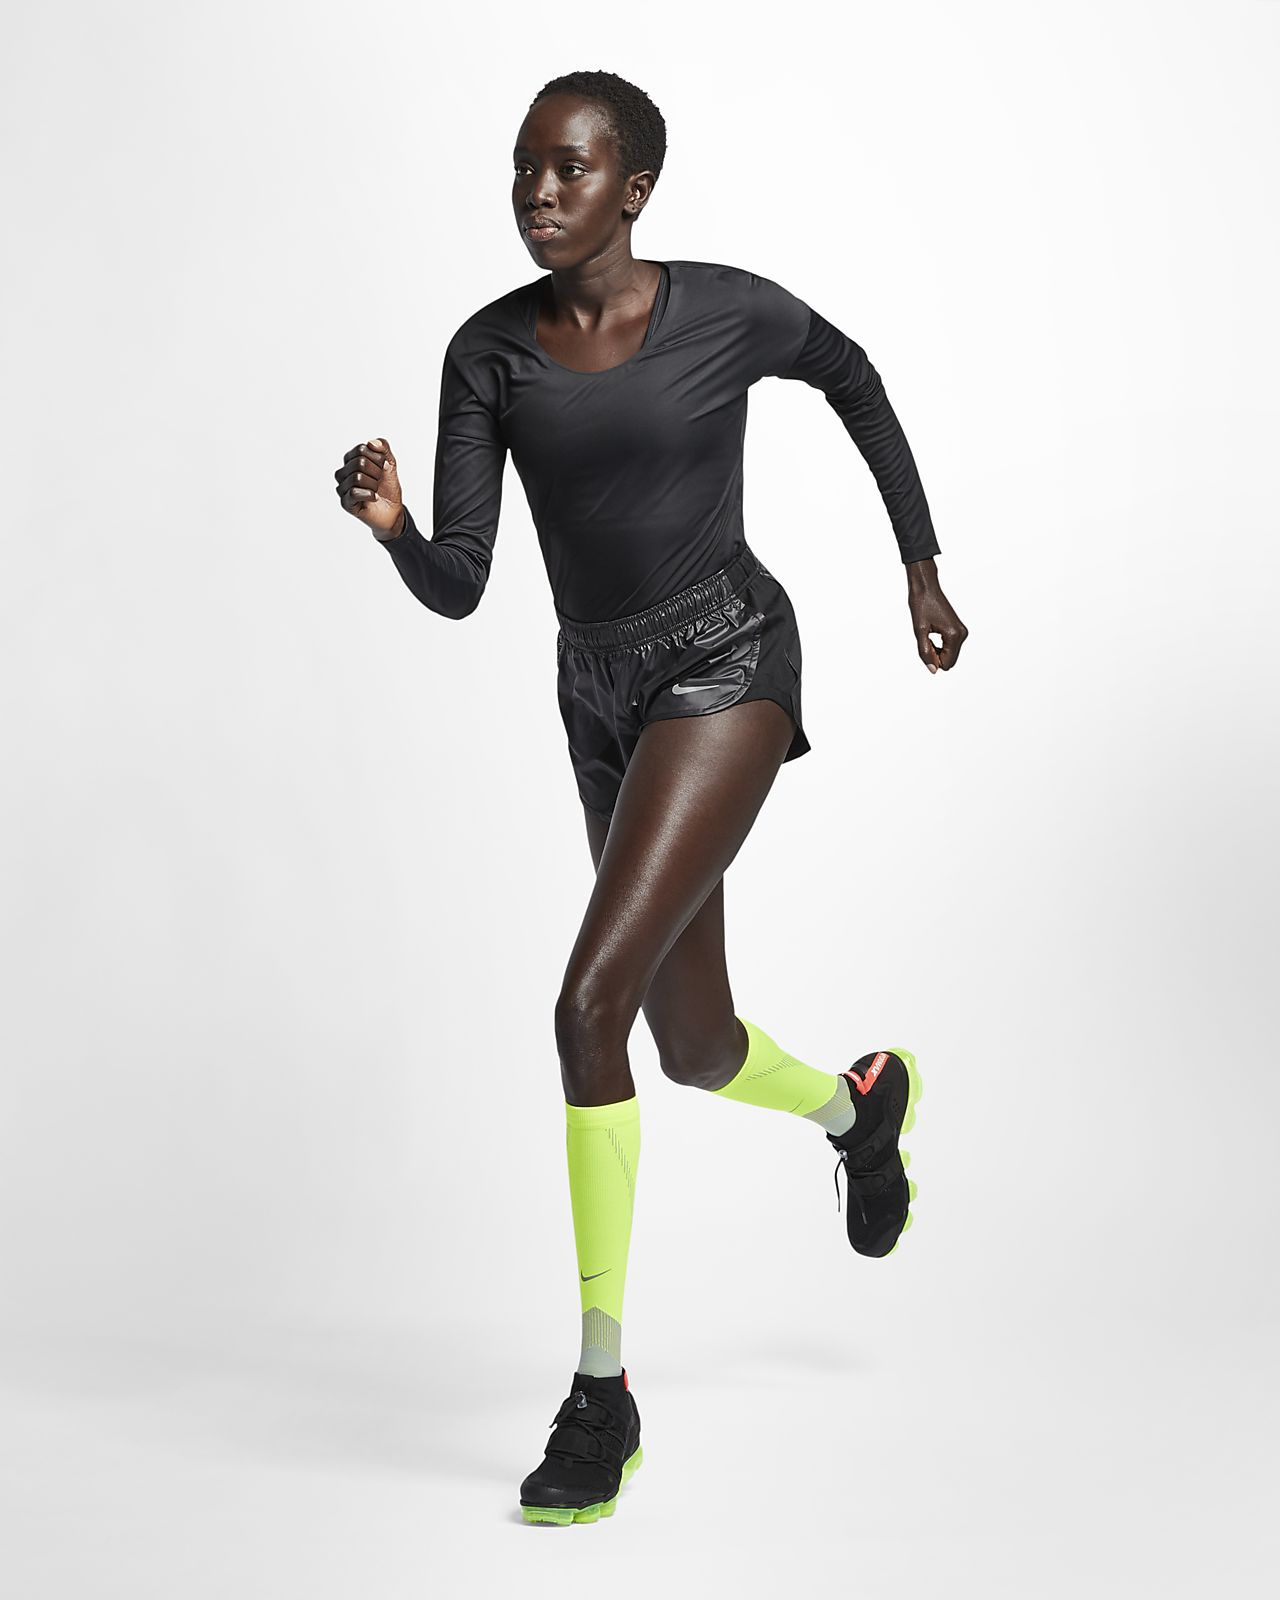 nueva temporada envío complementario patrones de moda Nike City Sleek Women's Long-Sleeve Running Top. Nike LU